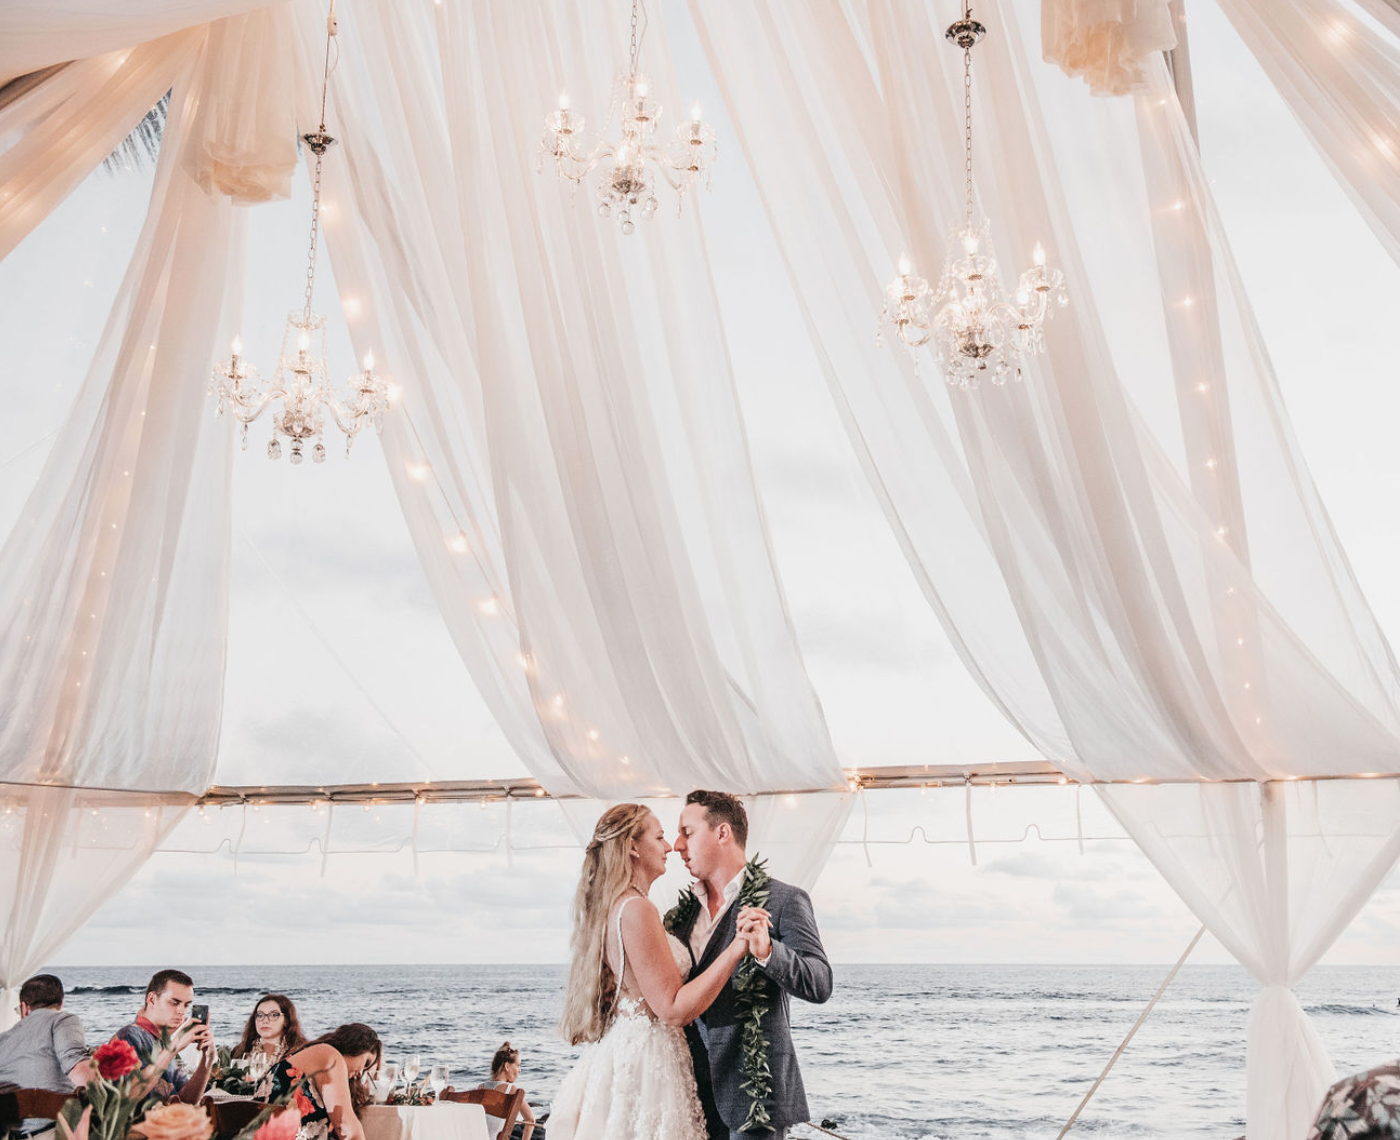 The Beach House Kauai Destination Wedding Tent Enhancements Beach House Kauai Oceanfront Wedding Kauai Wedding